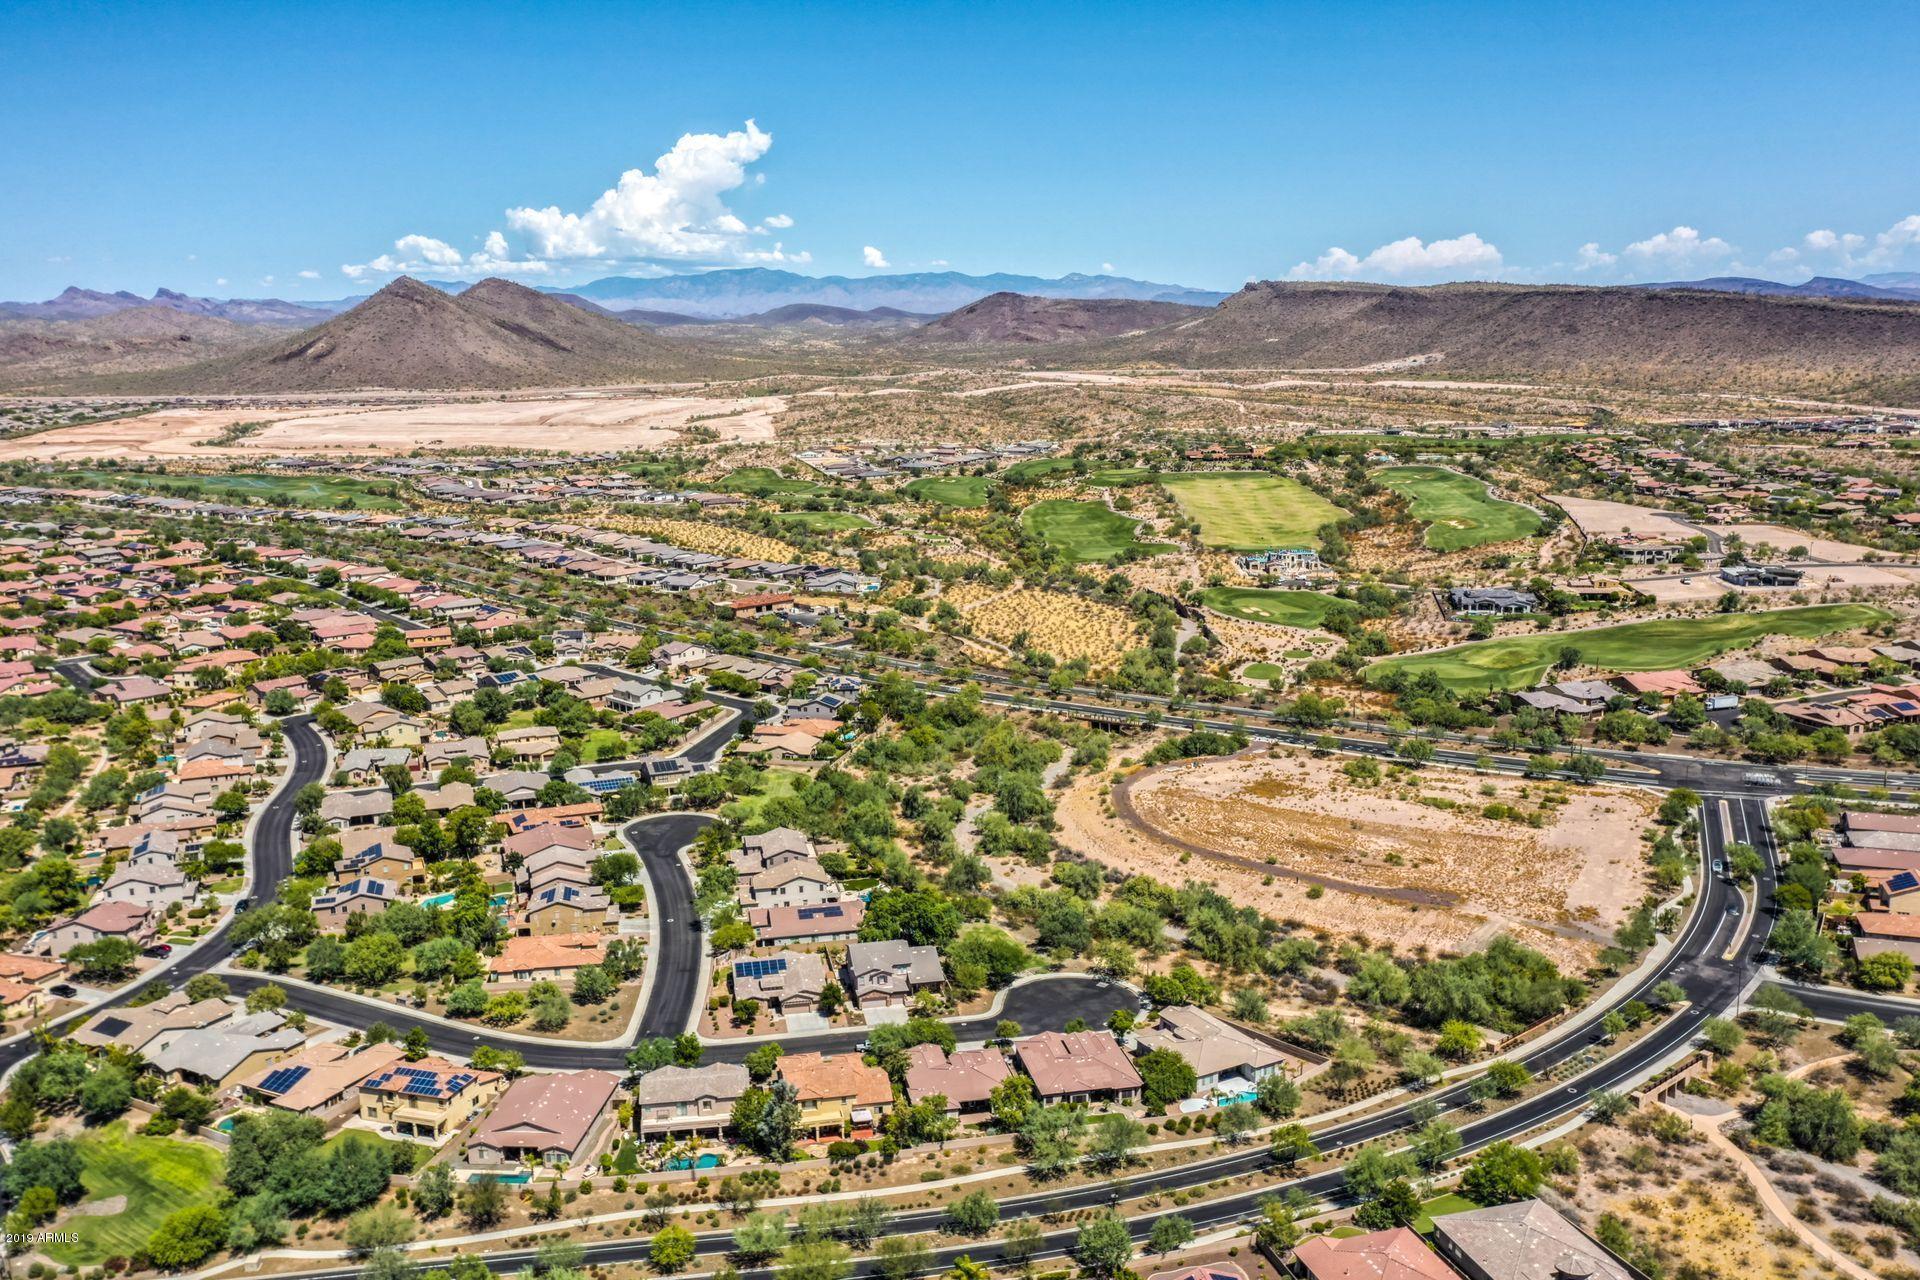 MLS 5971190 12309 W Dove Wing Way, Peoria, AZ 85383 Peoria AZ Vistancia Village